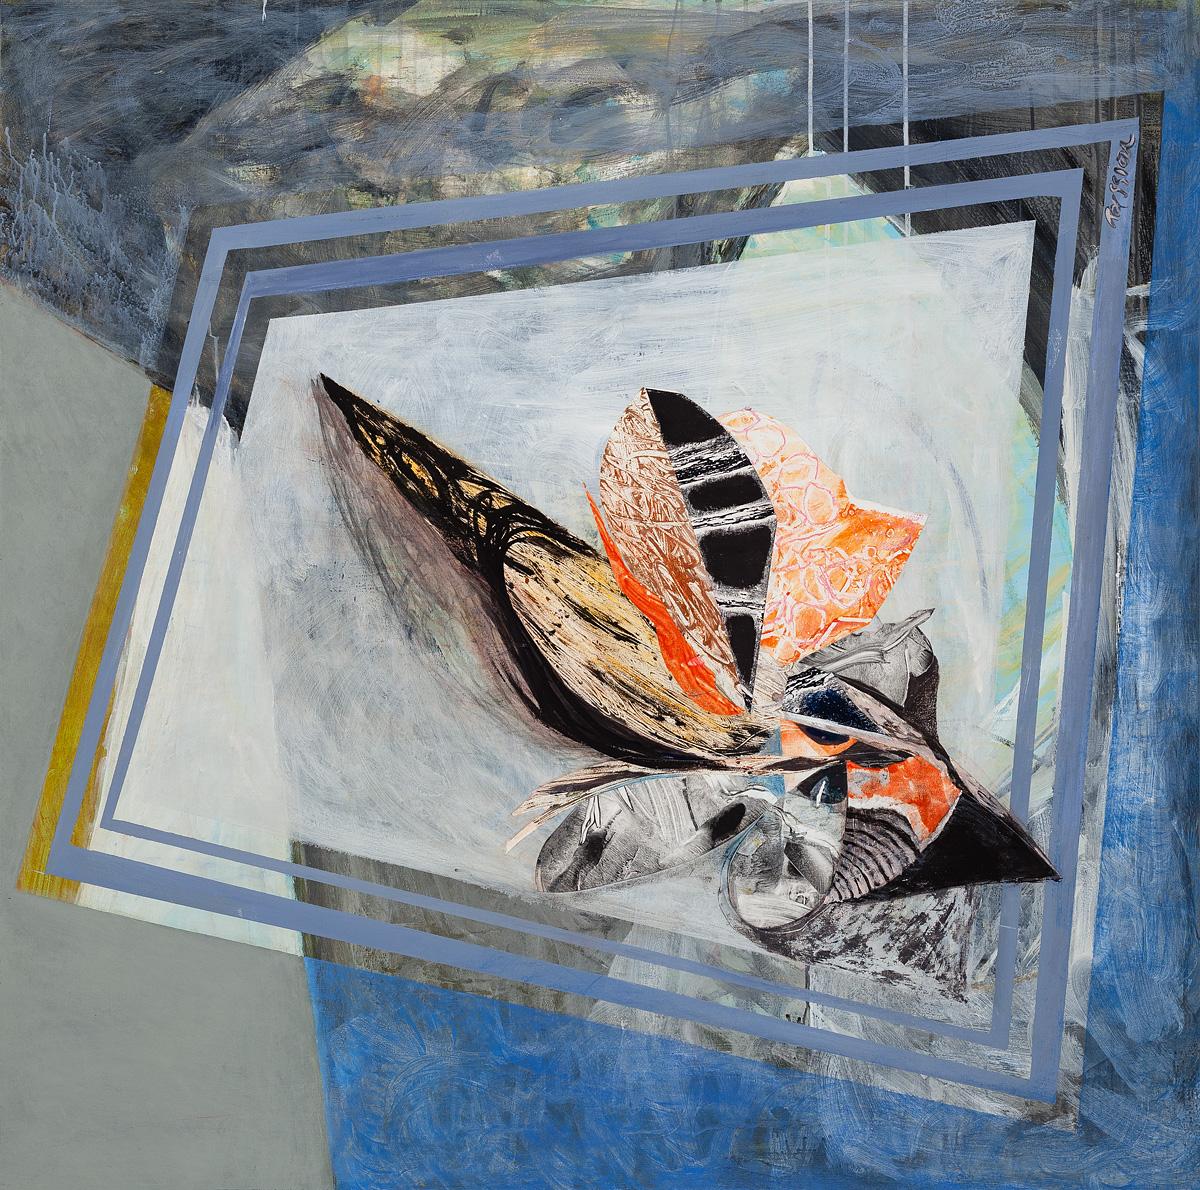 Peaceful Sleep,  mixed media, acrylic, collage on wood panels, 48 x 48 inches